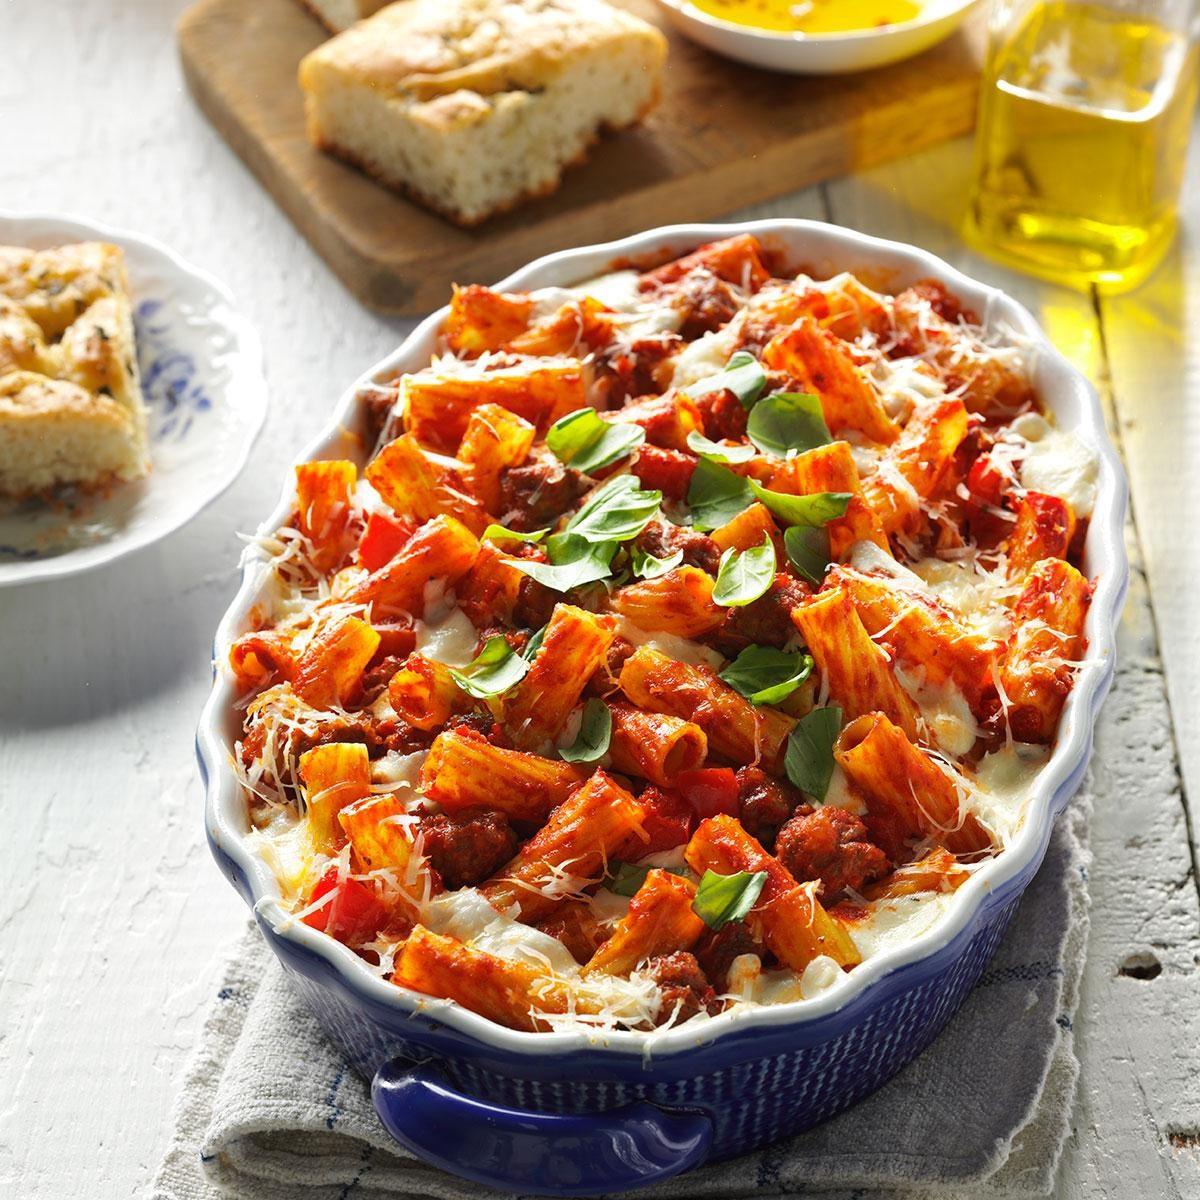 65 Italian Potluck Ideas To Feed A Crowd